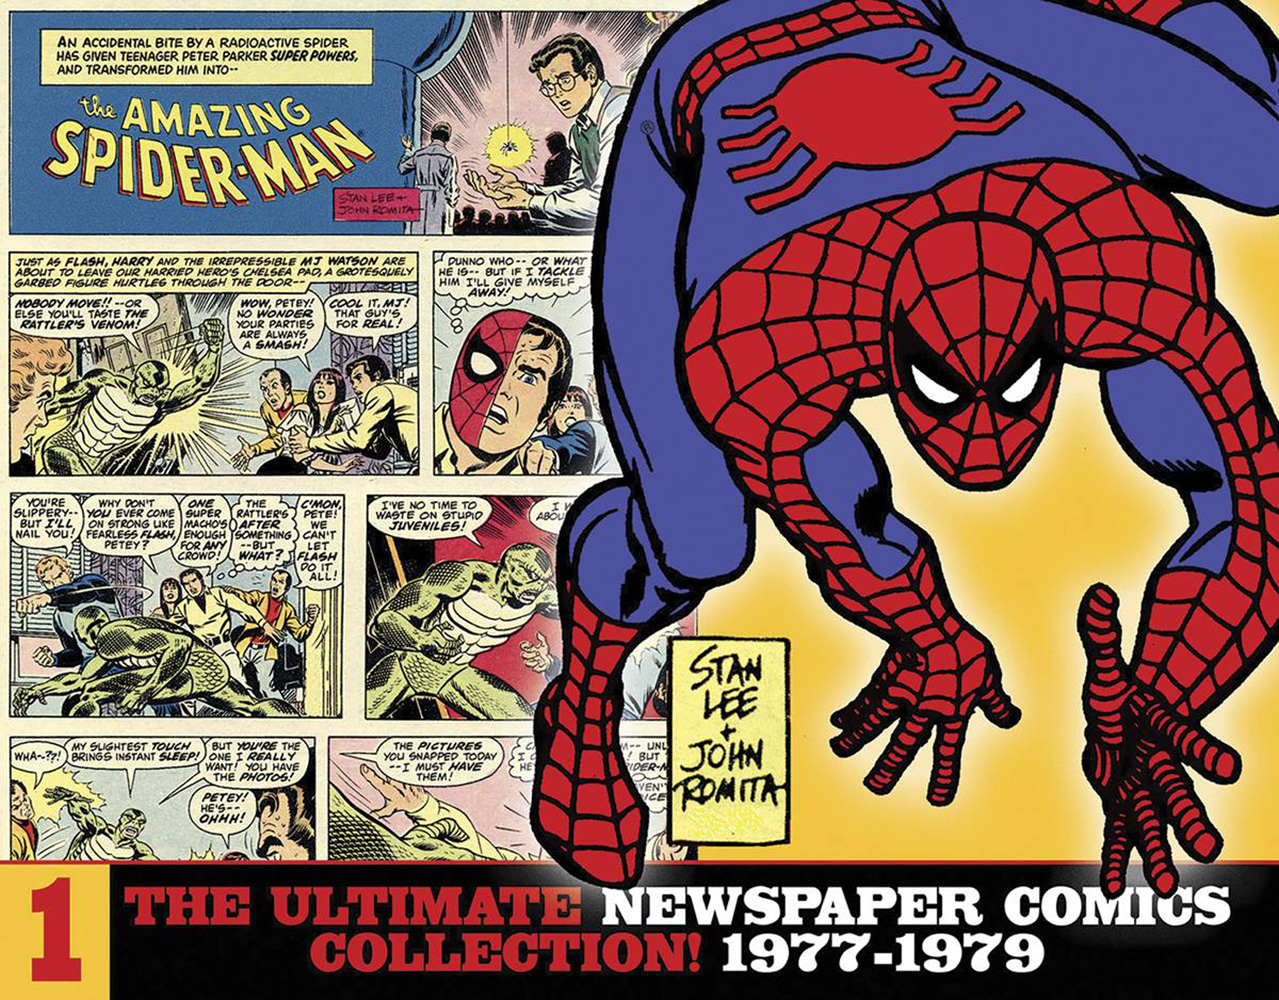 Amazing Spider-Man —Newspaper Comics Vol. 1